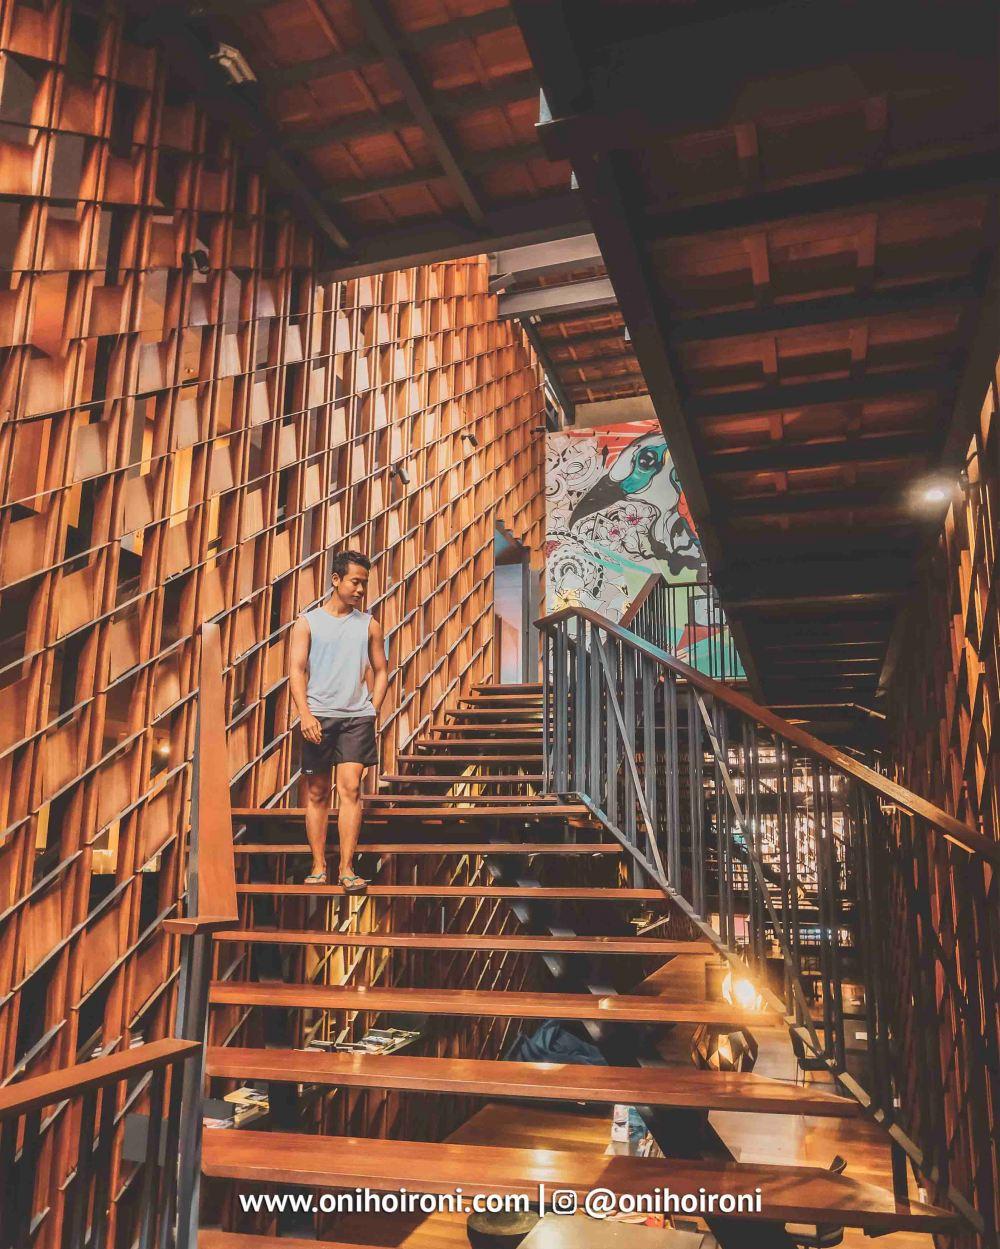 2 Lobby Artotel Sanur, Bali Oni Hoironi copy